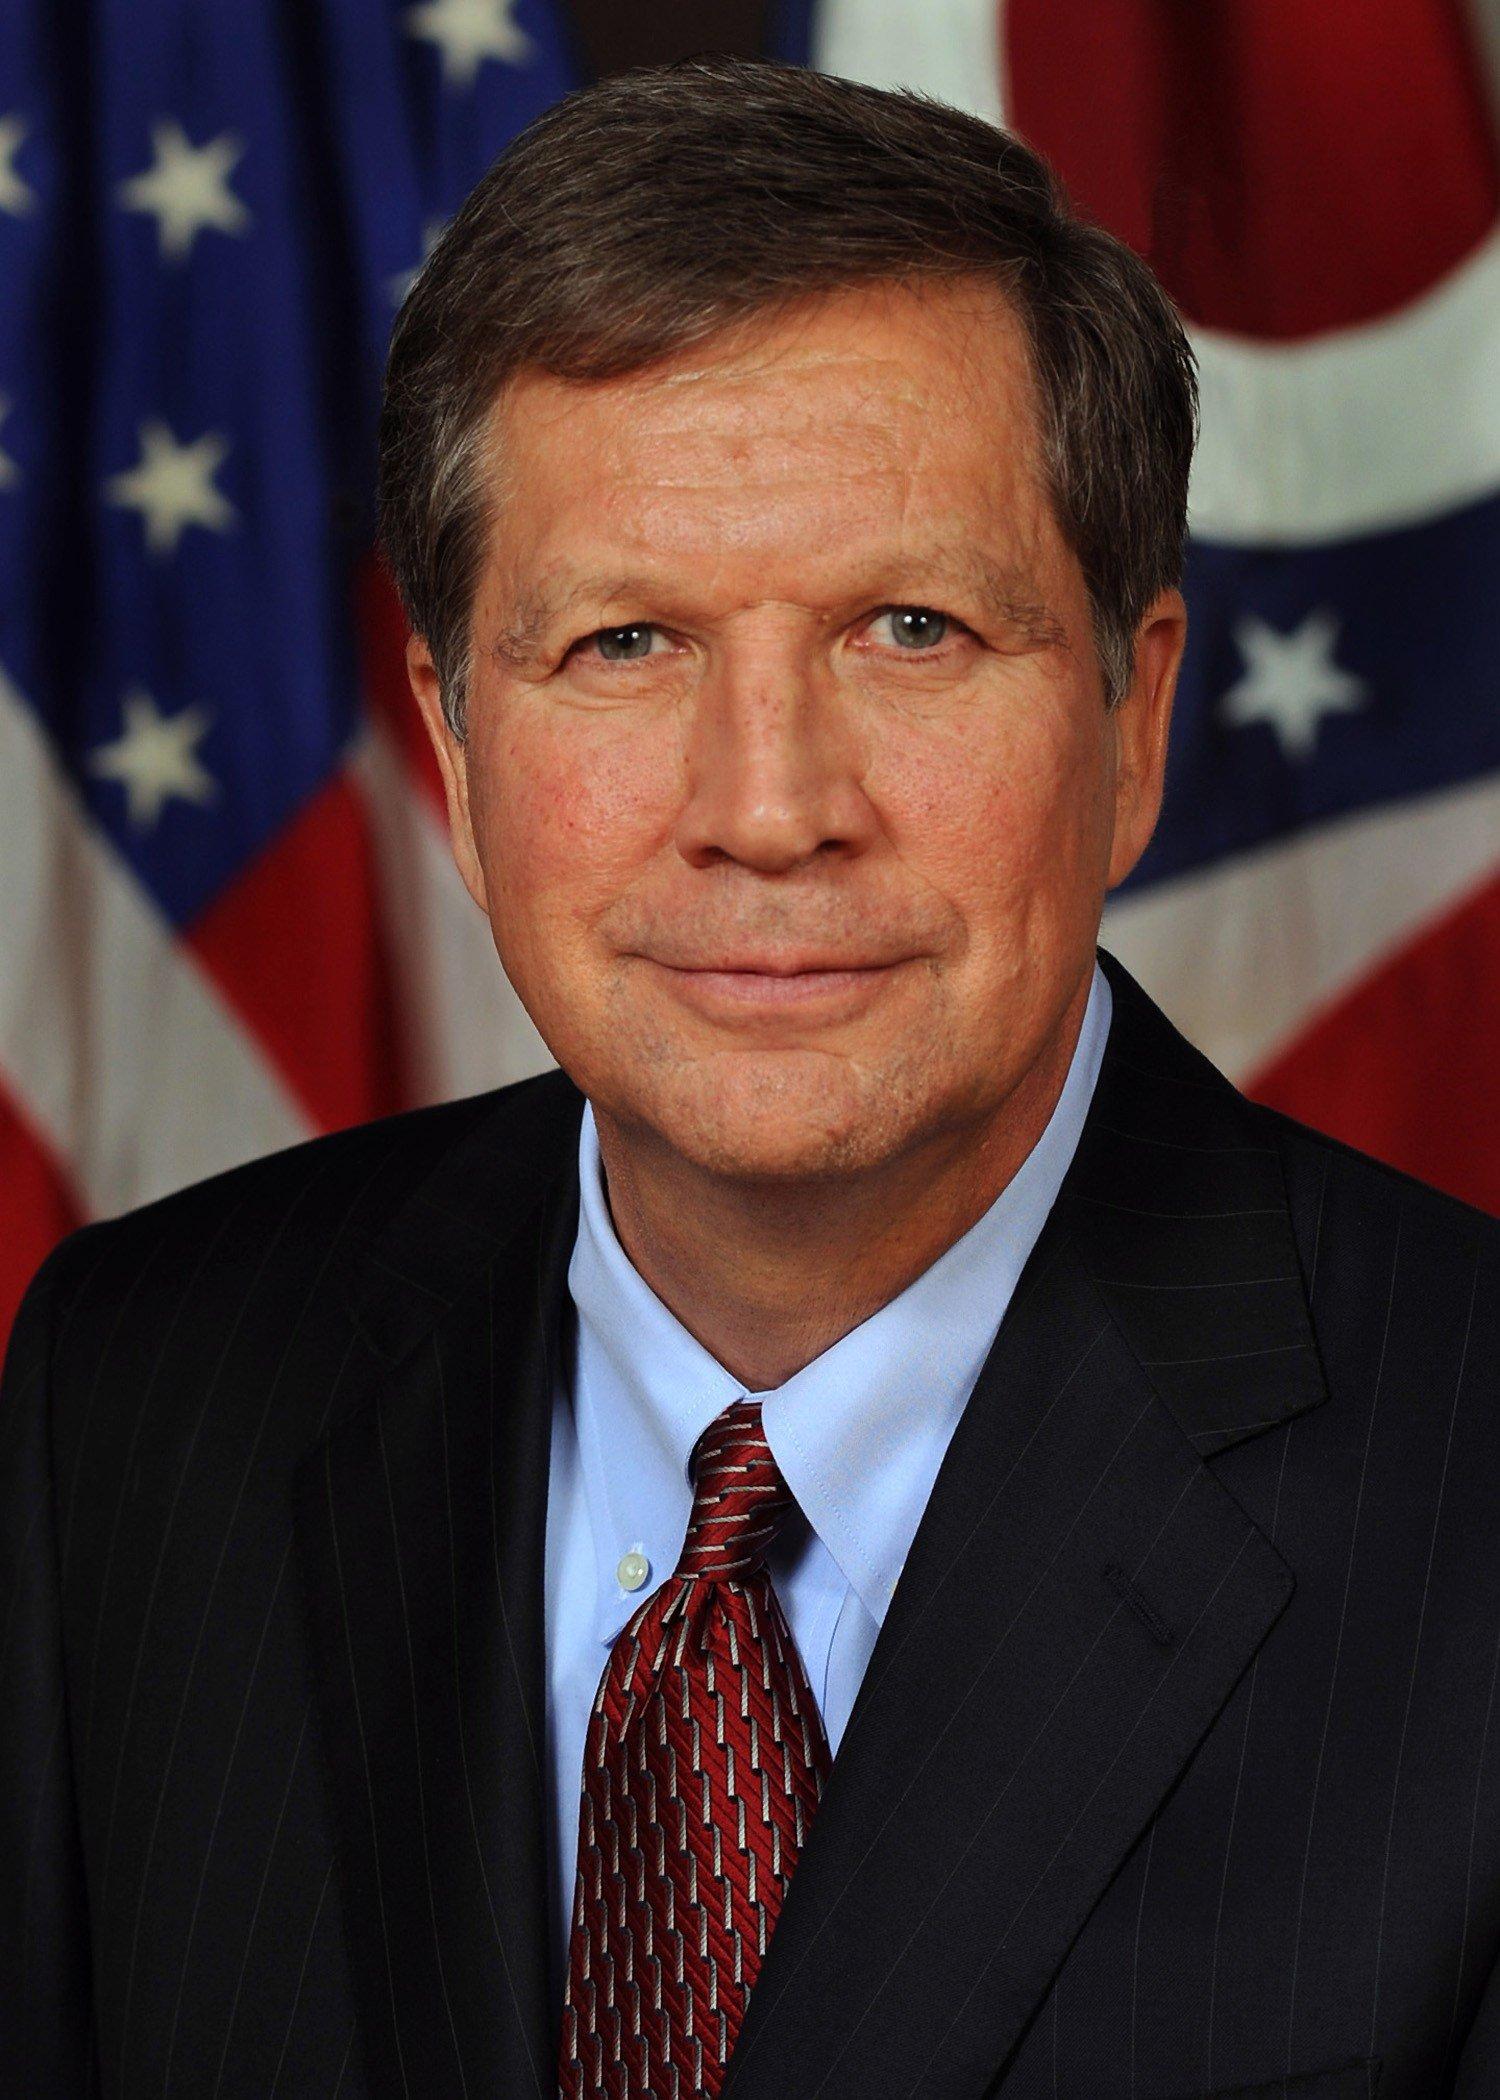 John Kasich (Source: www.governor.ohio.gov)